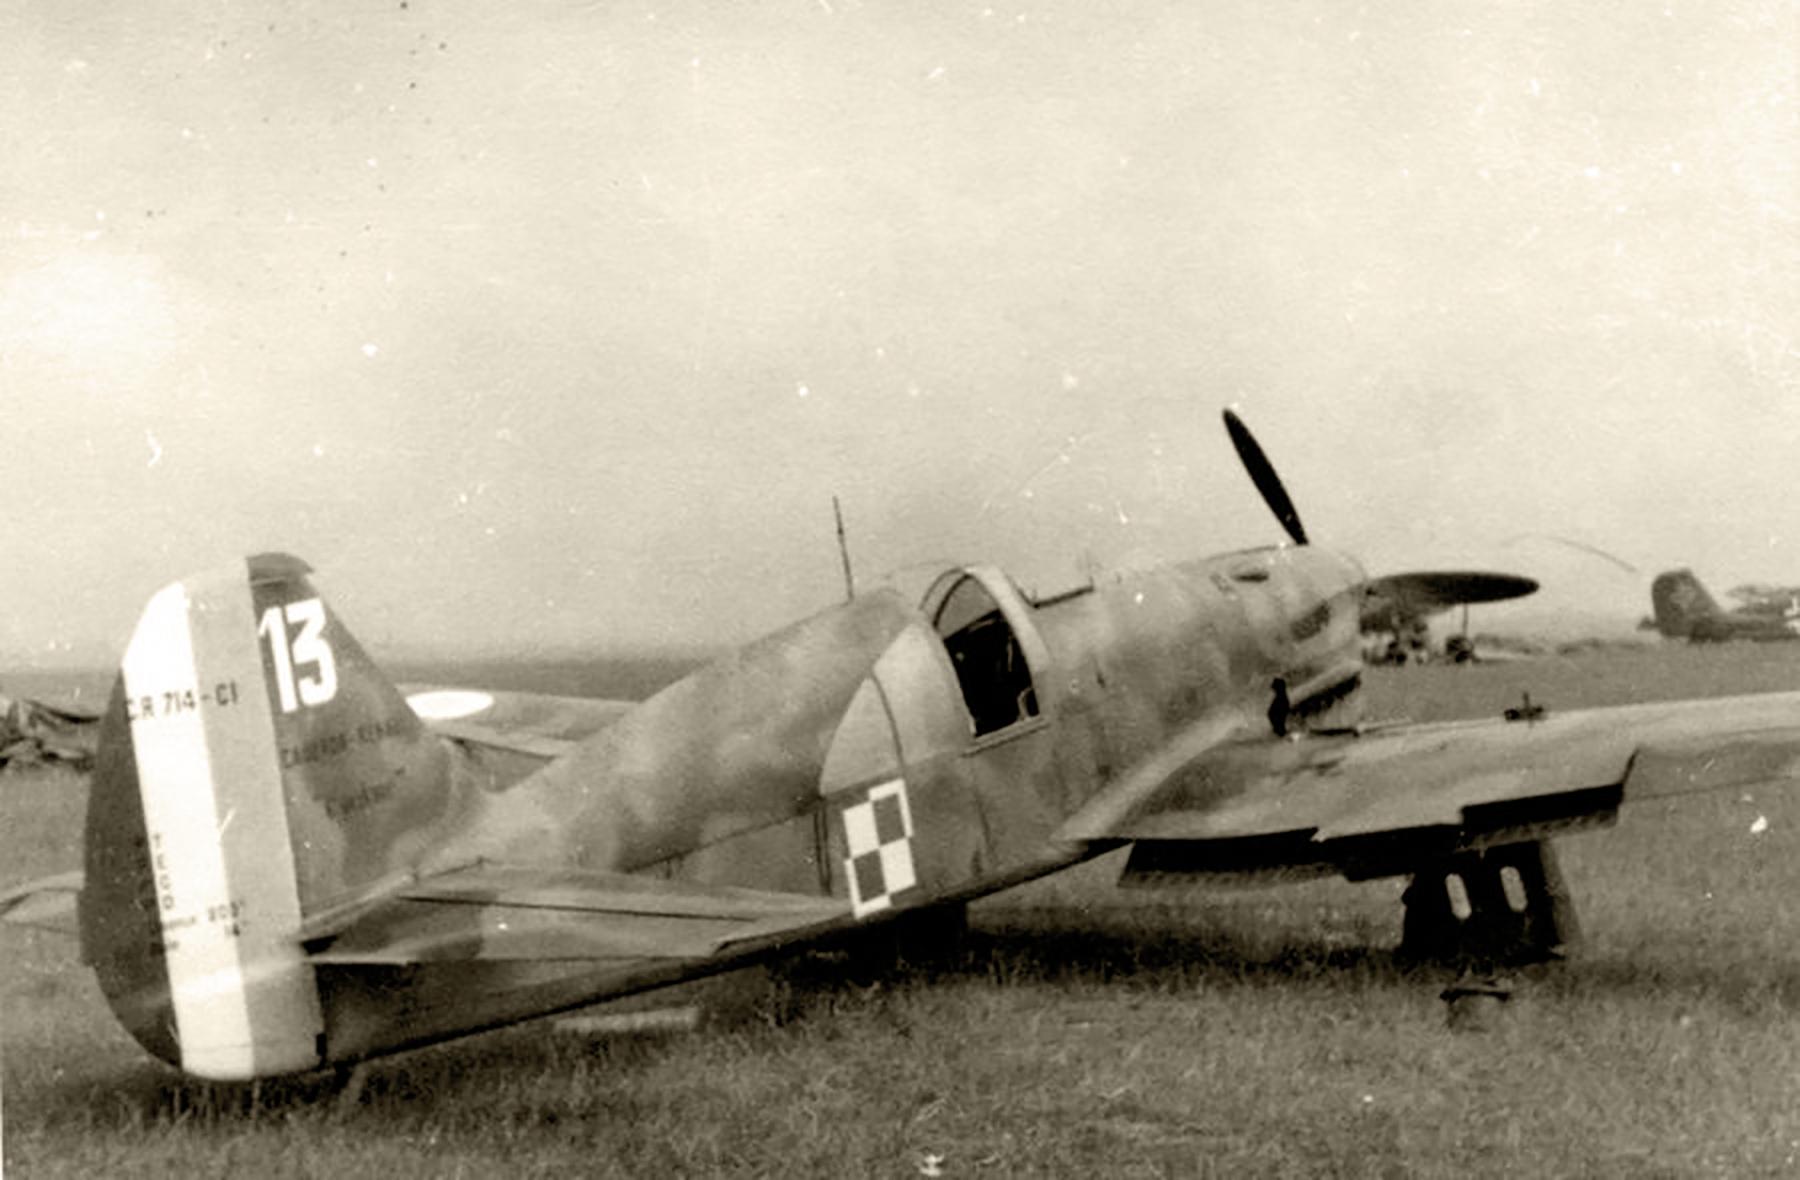 French Caudron CR 714C1 Cyclone GC I.145 White 13 Polish AF France 1940 web 01